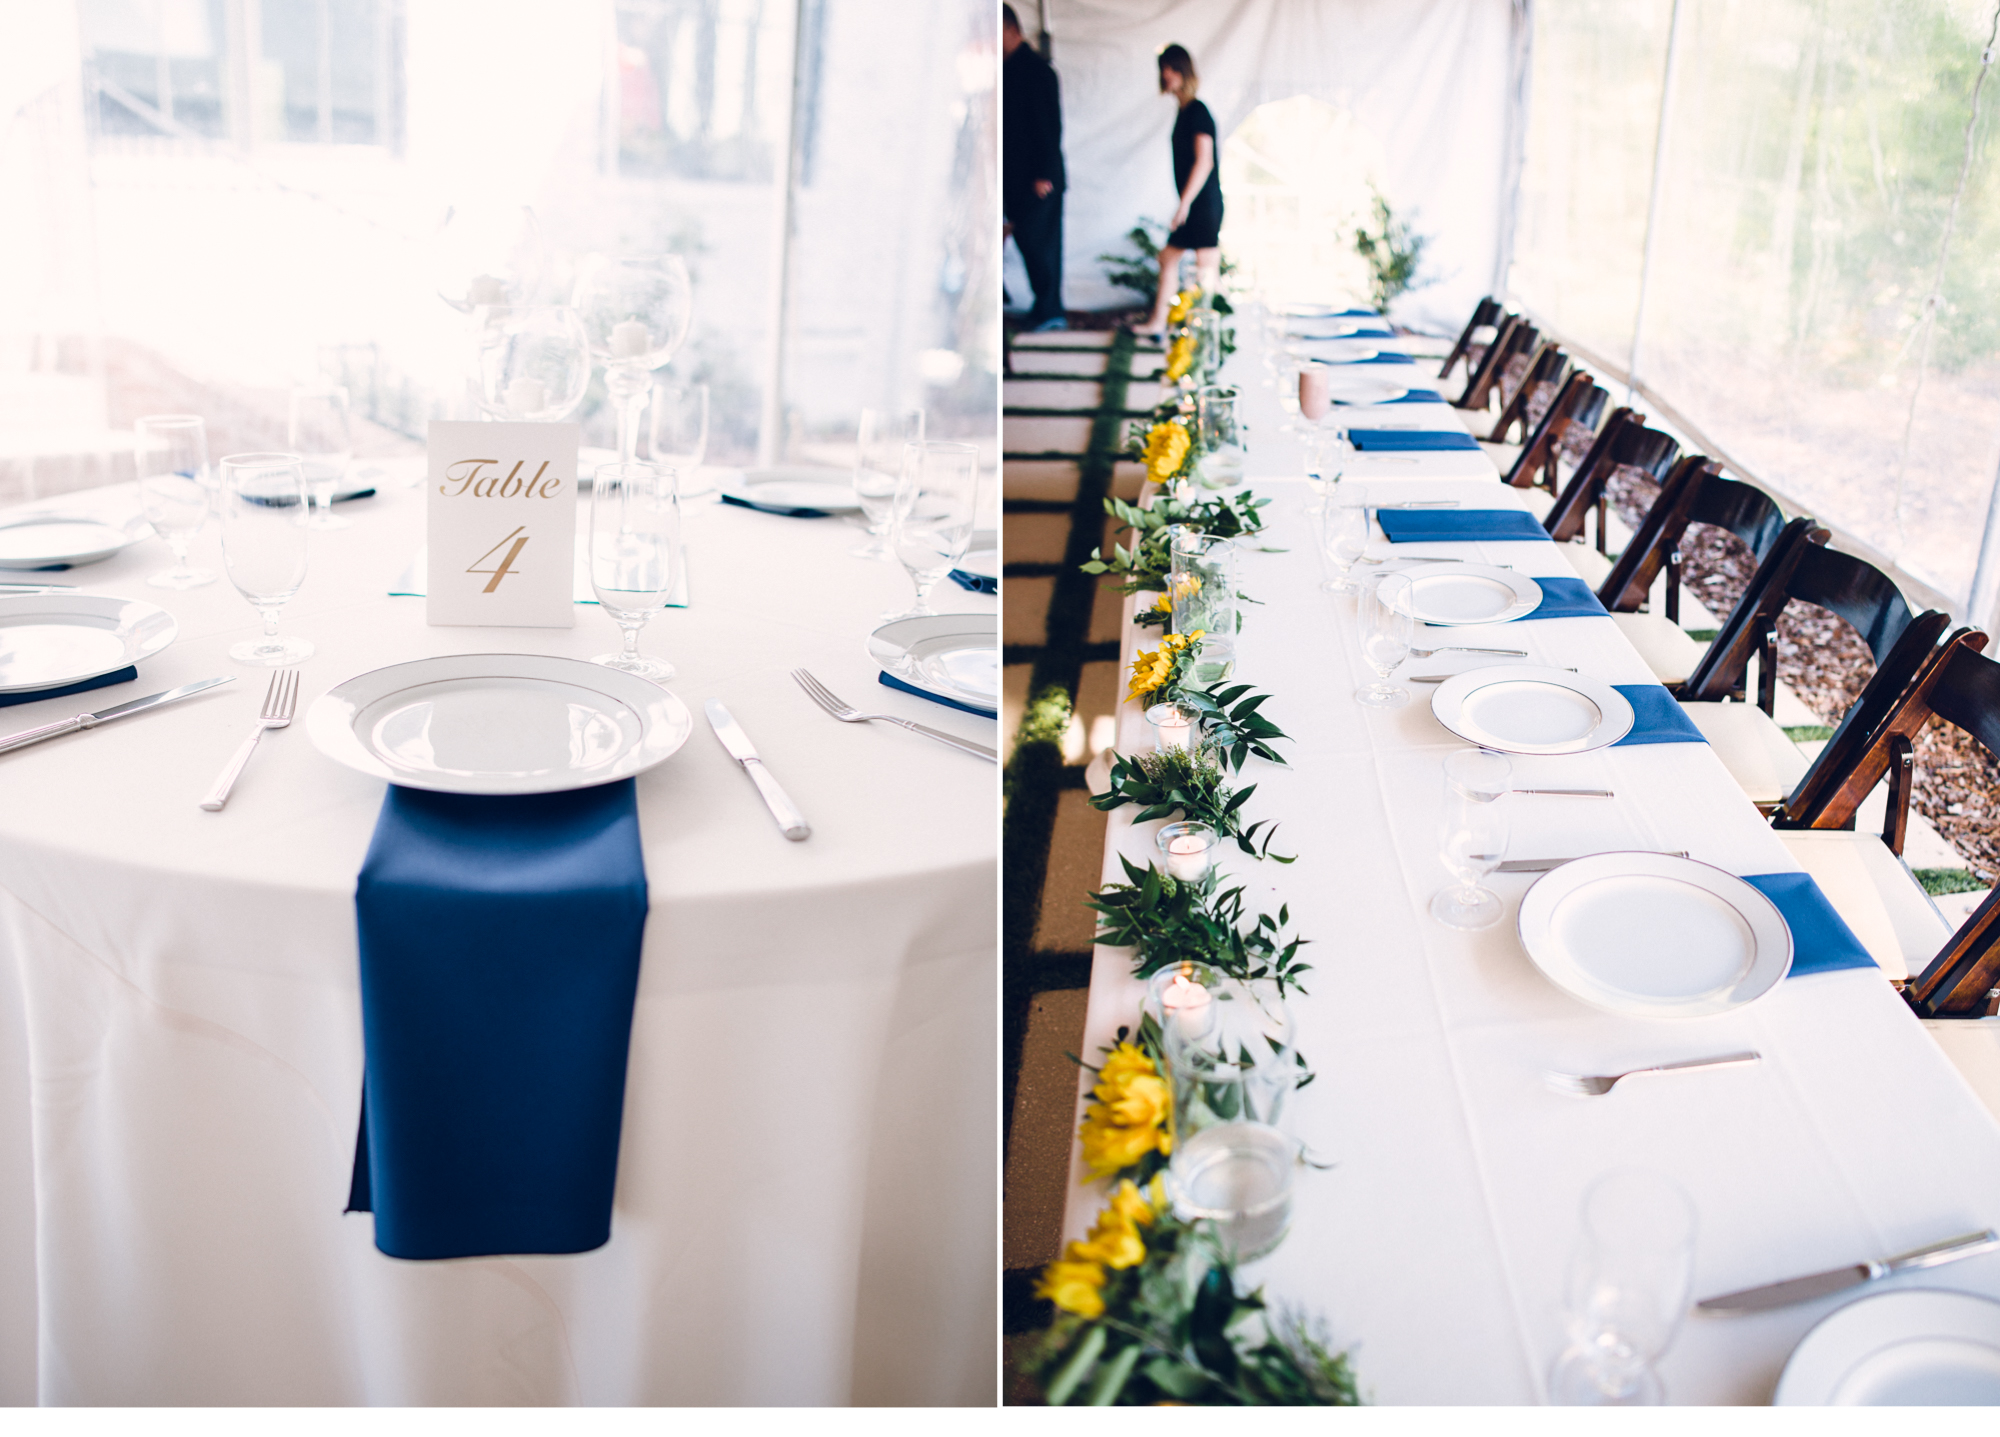 Wedding Reception Place Settings